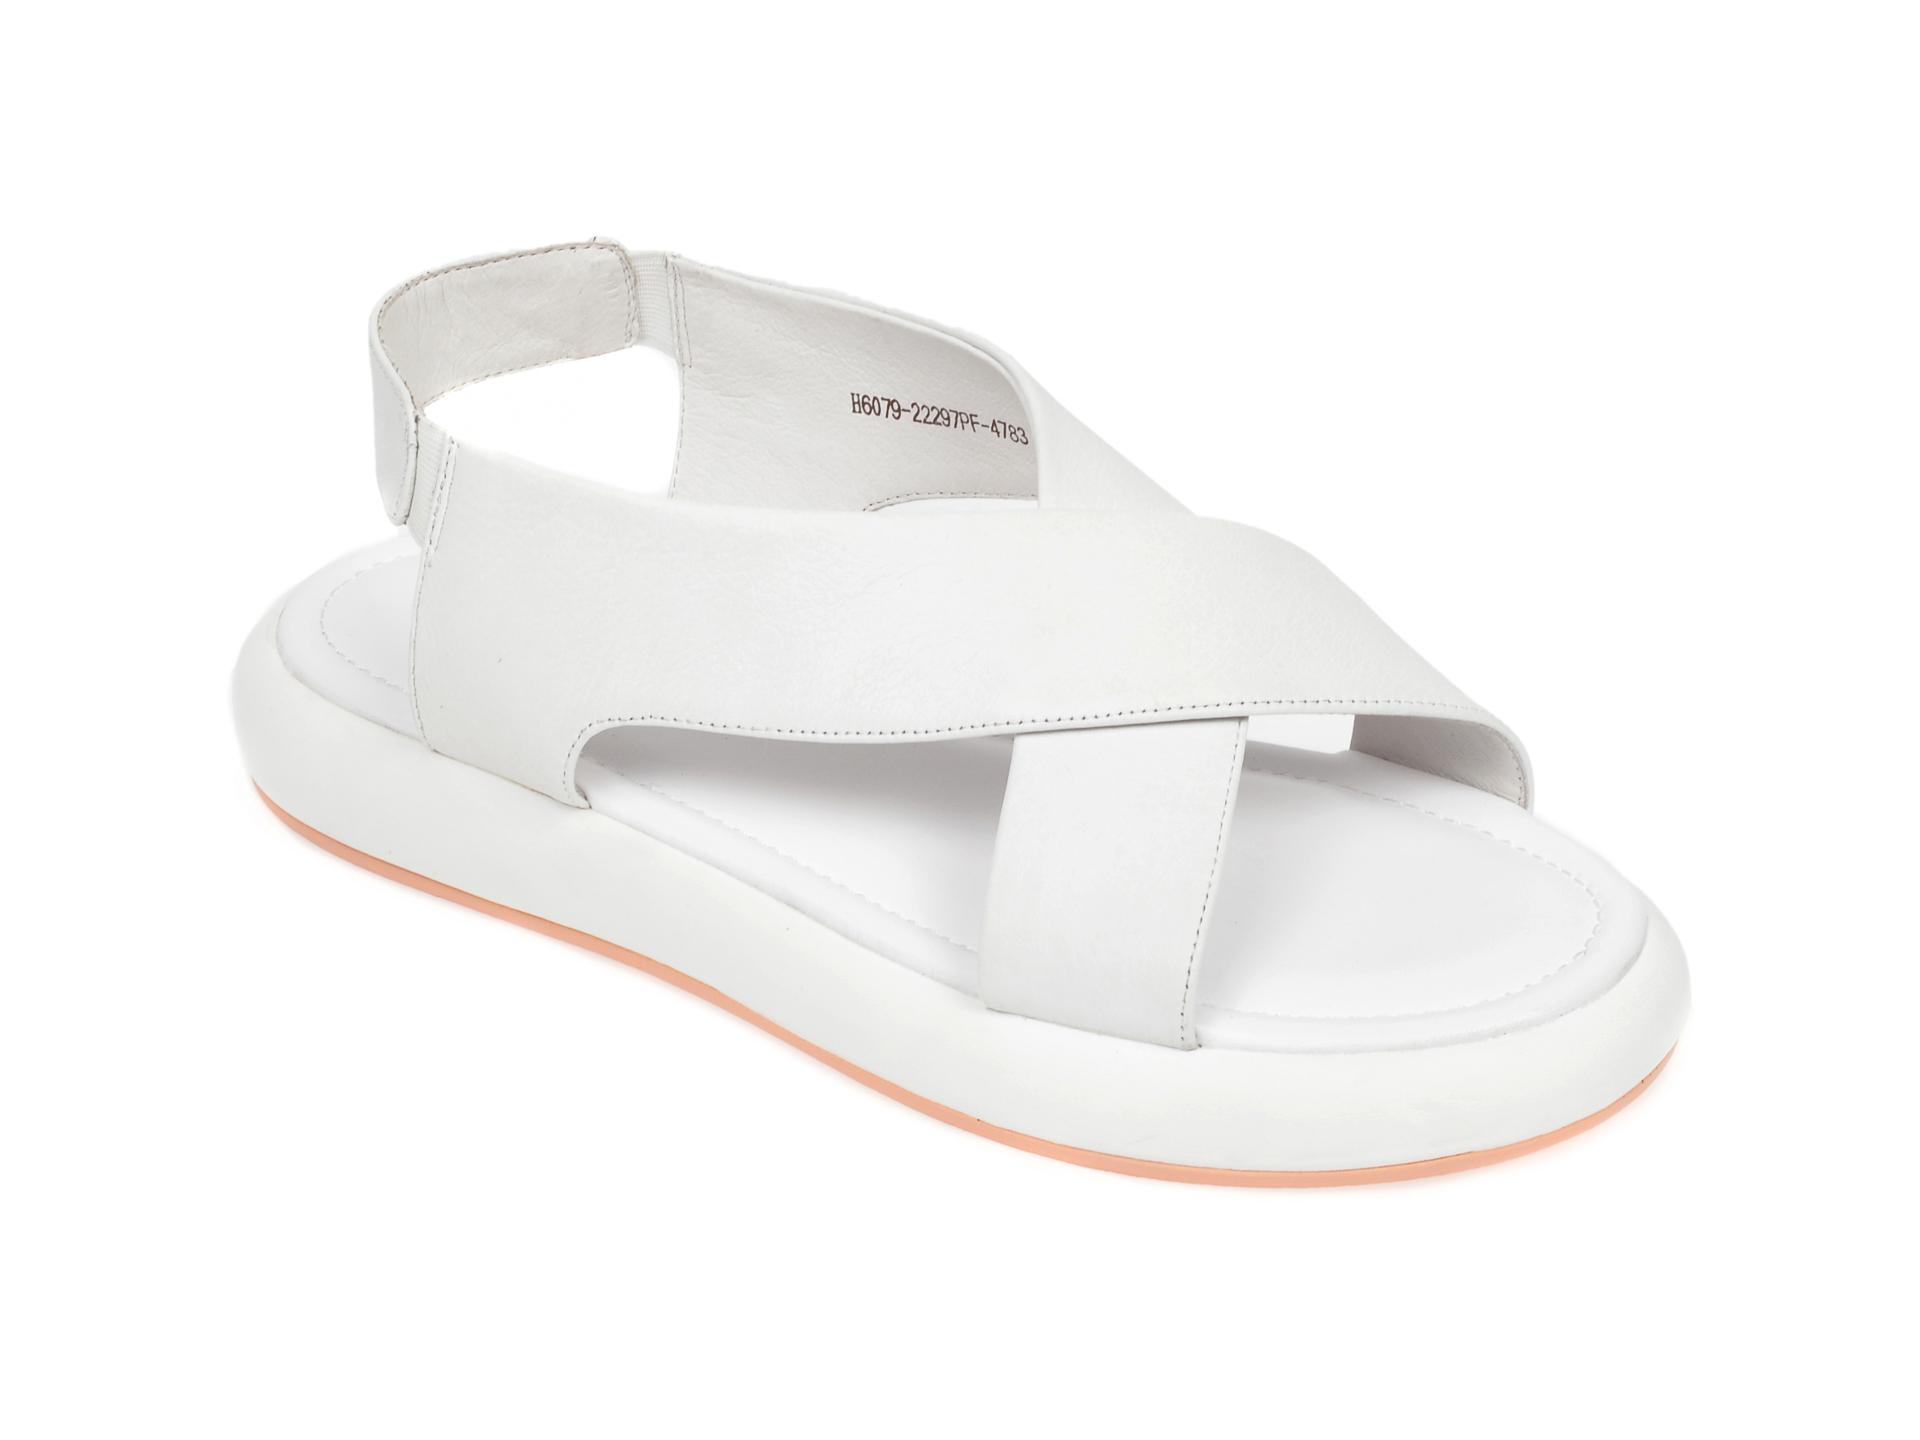 Sandale FLAVIA PASSINI albe, H607922, din piele naturala